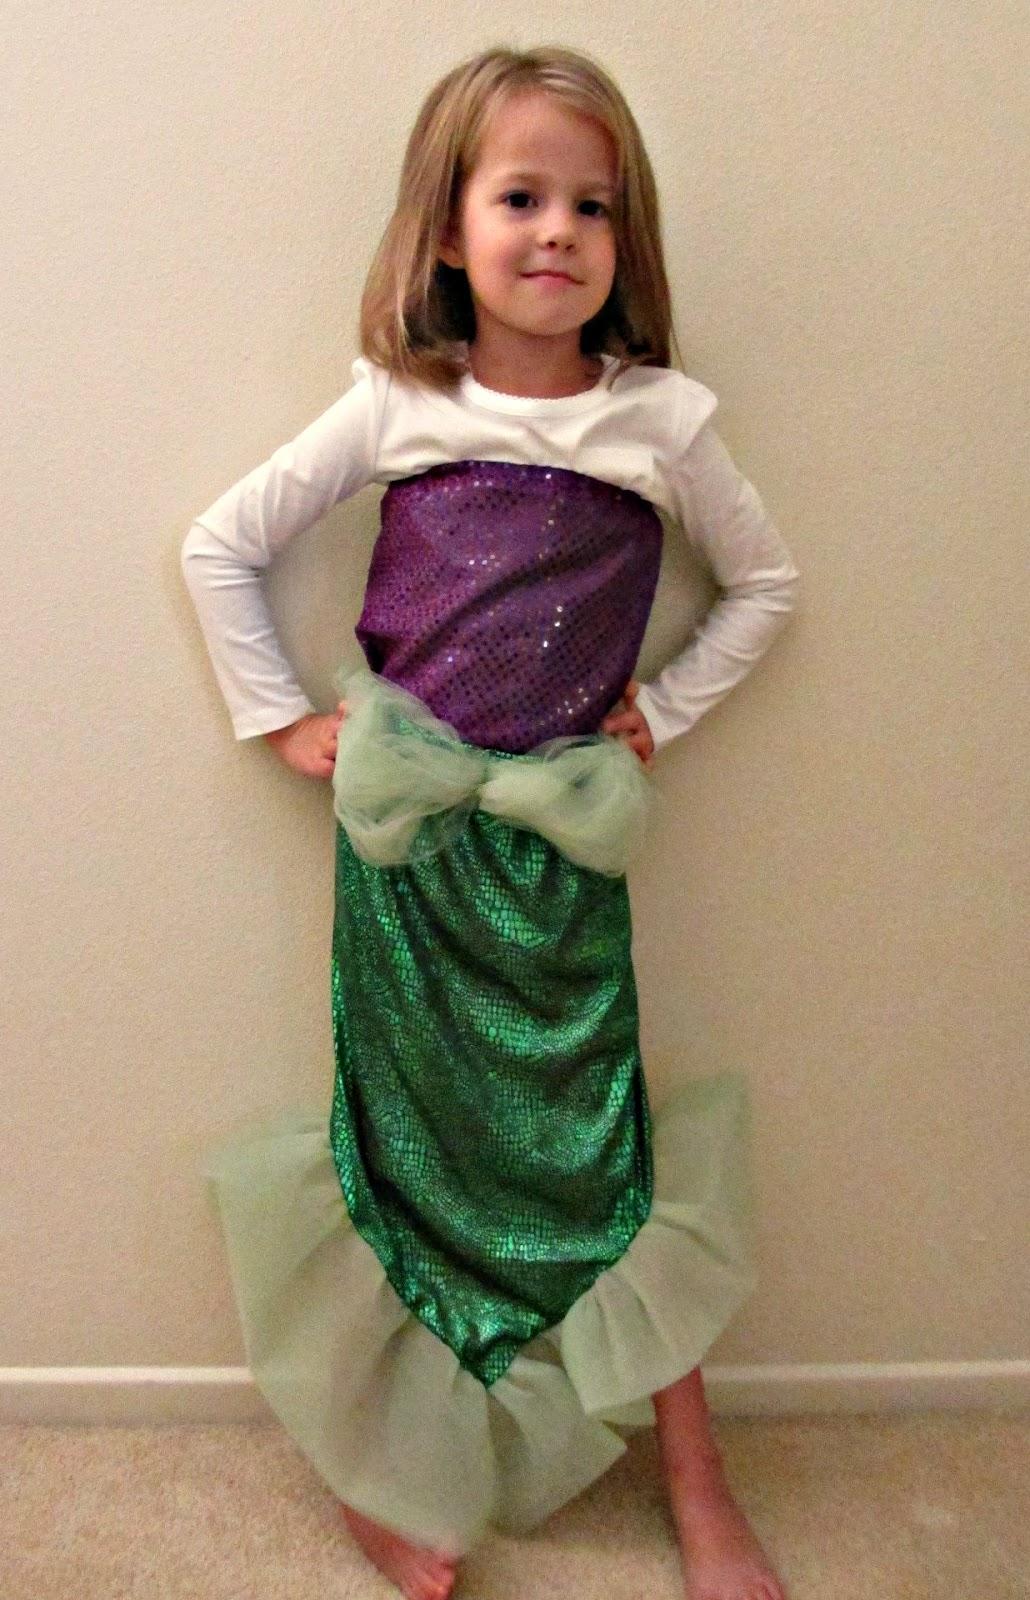 Diy mermaid costume top homemade mermaid costume